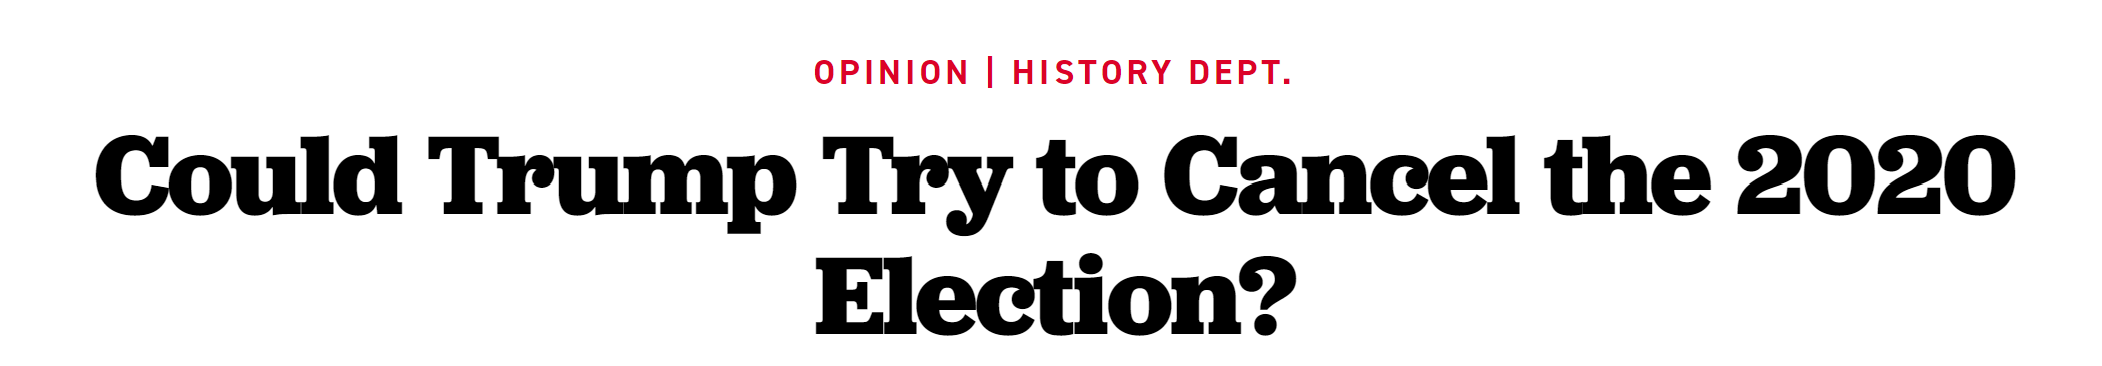 headline1.png